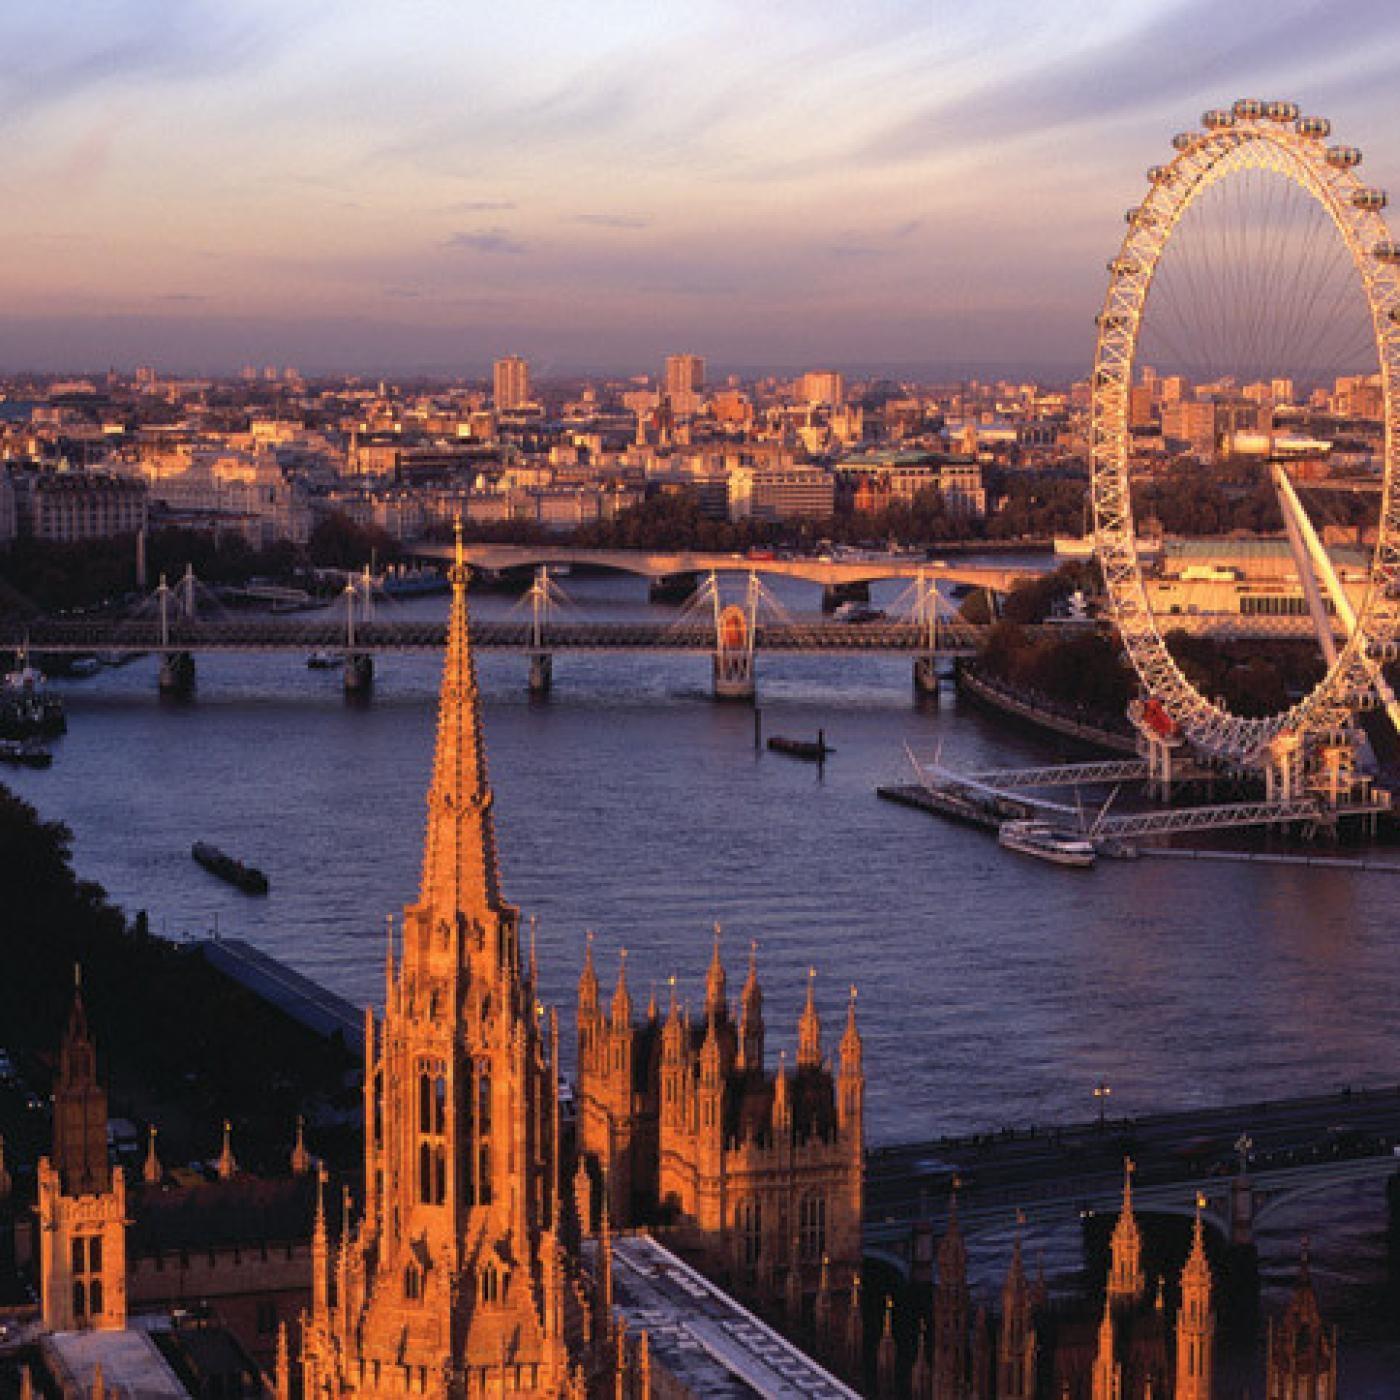 Anne à Londres - Angleterre - 1er Novembre 2020